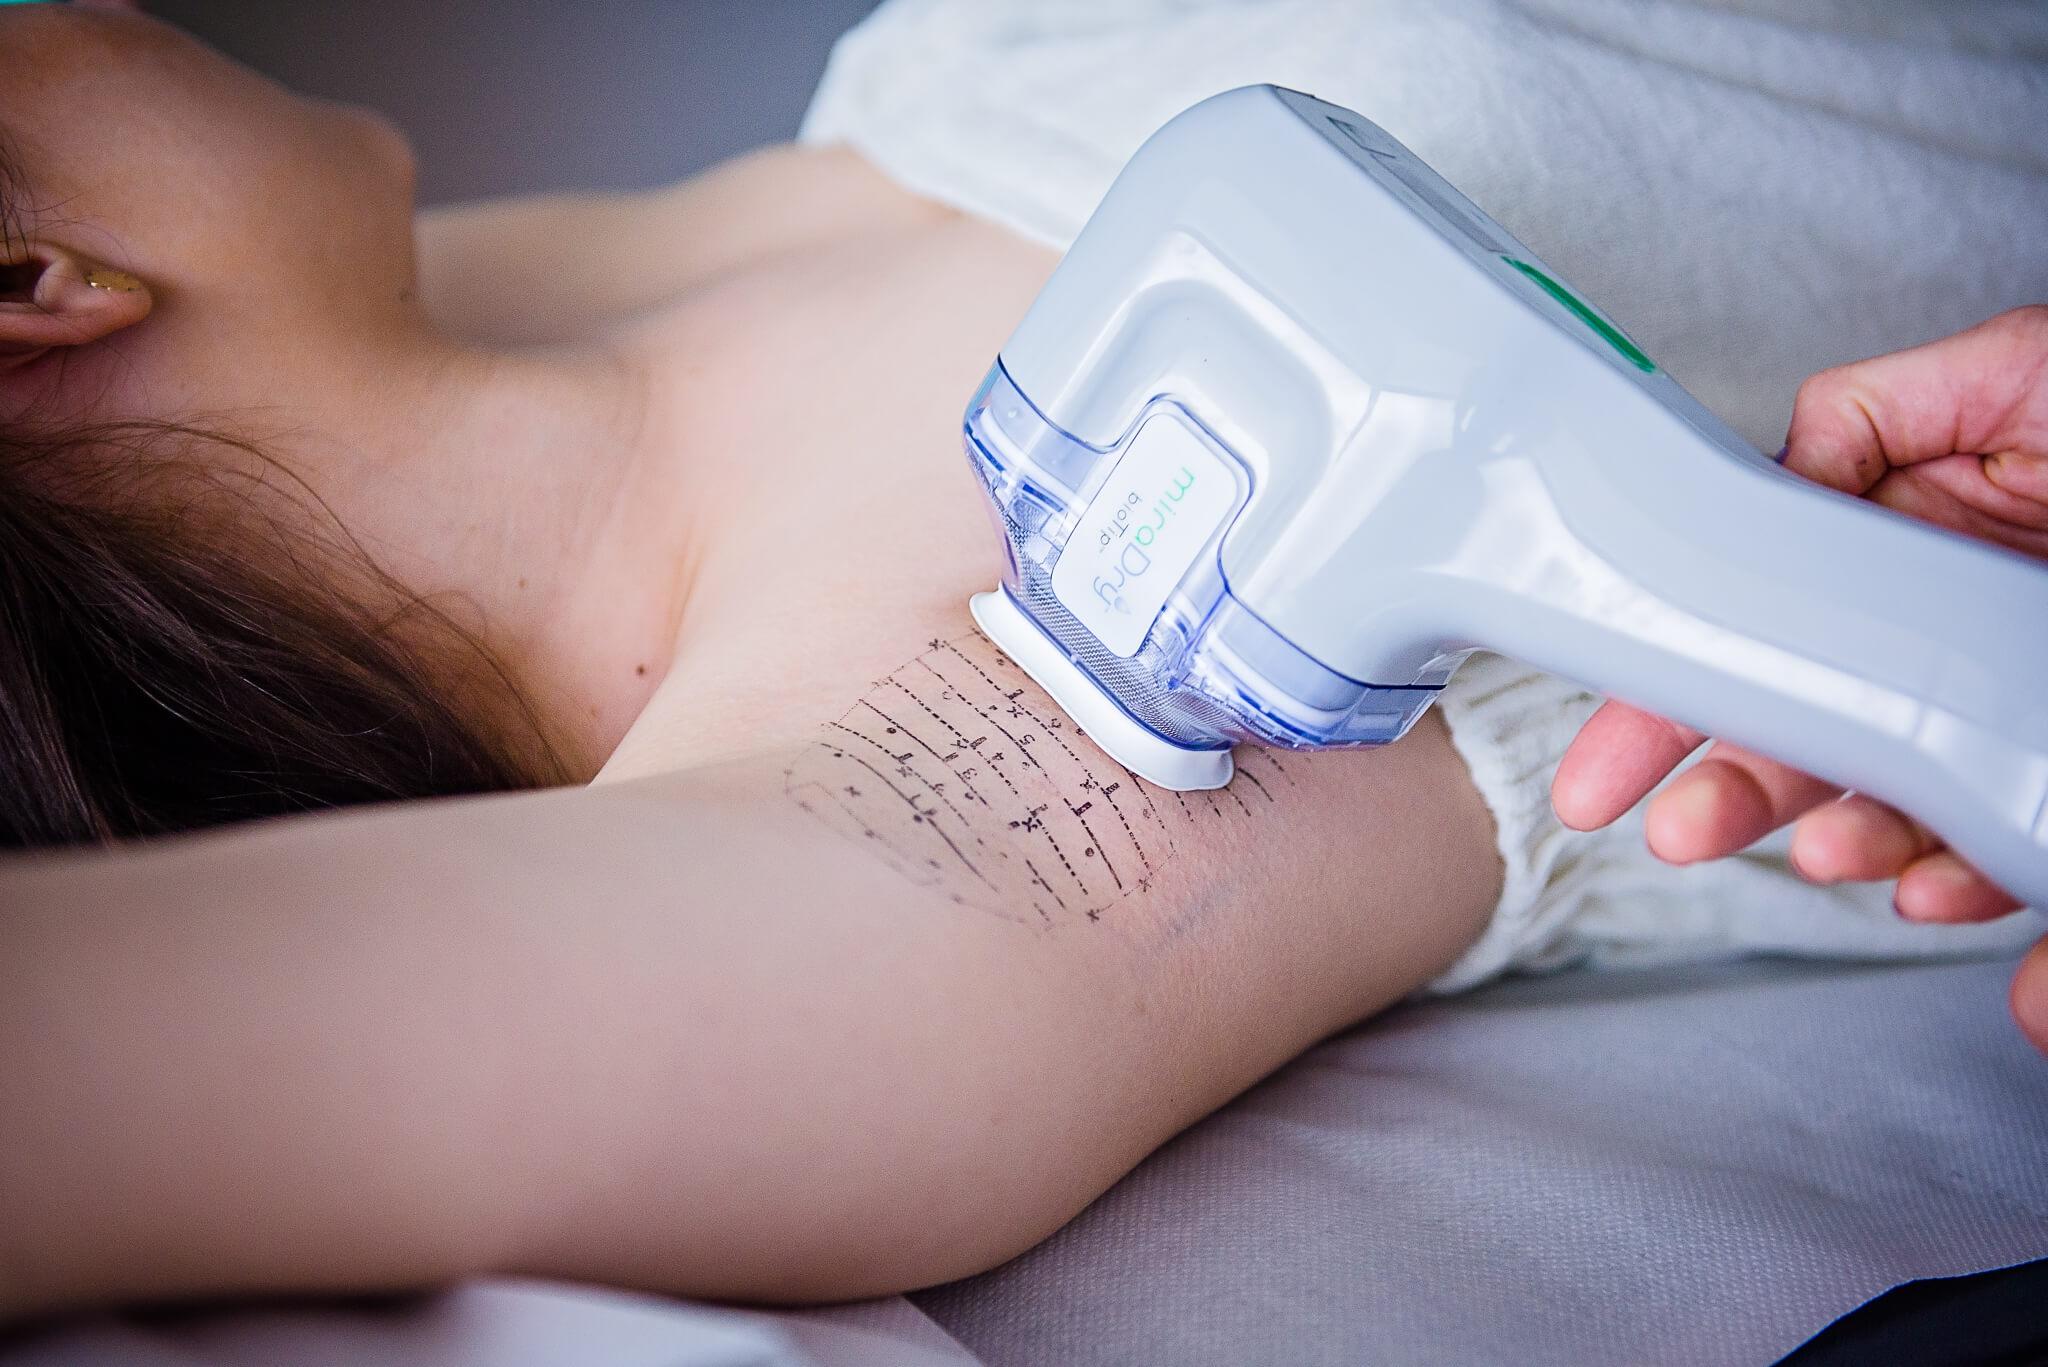 Hyperhidrosis treatment using the MiraDry method